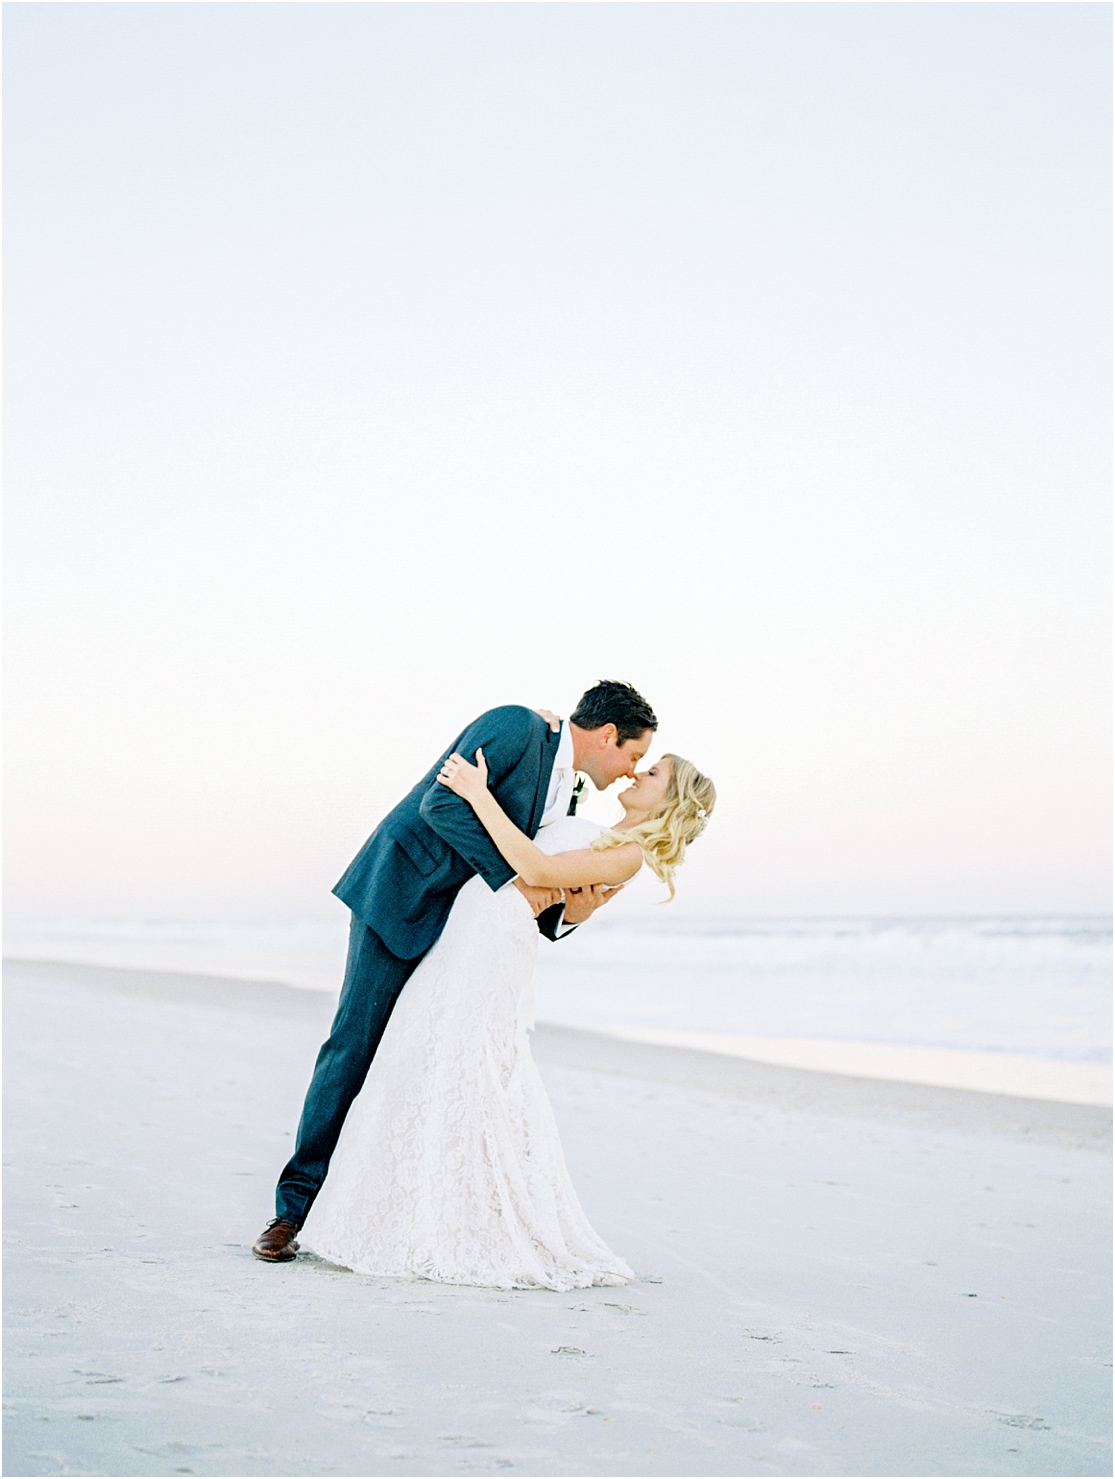 Lisa Silva Photography- Ponte Vedra Beach and Jacksonville, Florida Fine Art Film Wedding Photography- Wedding at the Ponte Vedra Inn and Club_0071.jpg